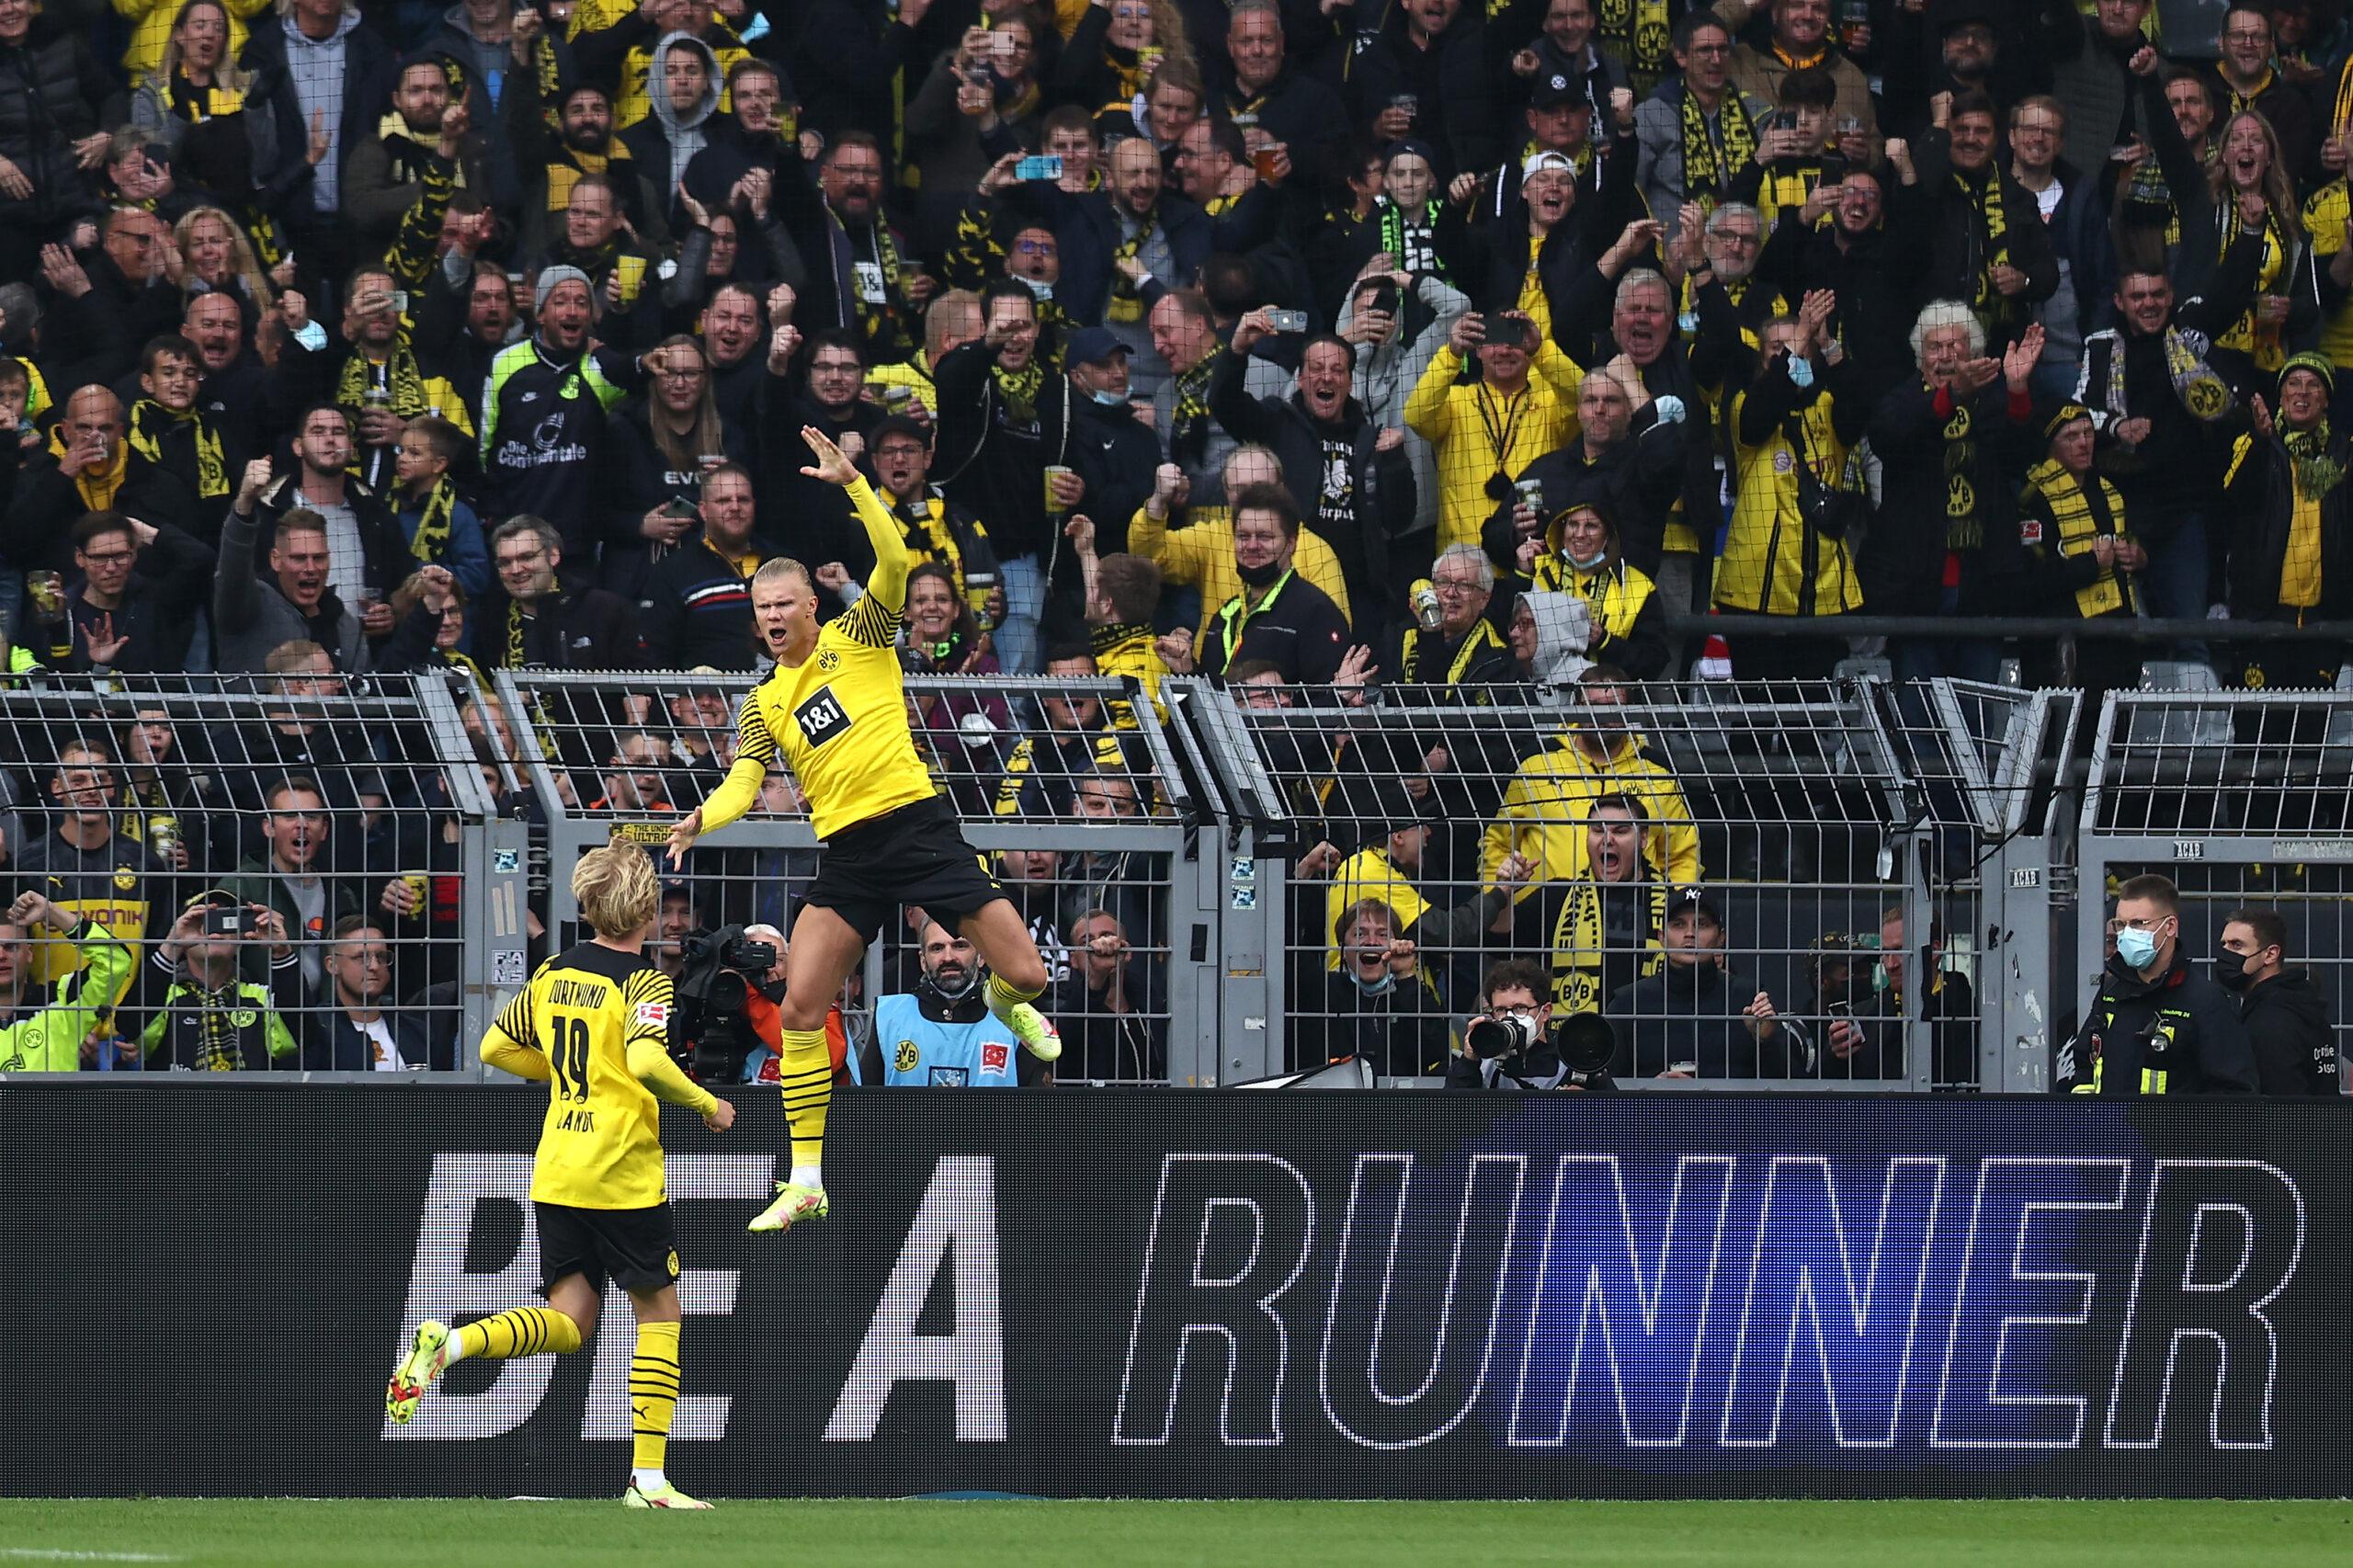 Erling Haaland retorna con gol en la victoria de Borussia Dortmund sobre Mainz 05. Foto: Getty Images.